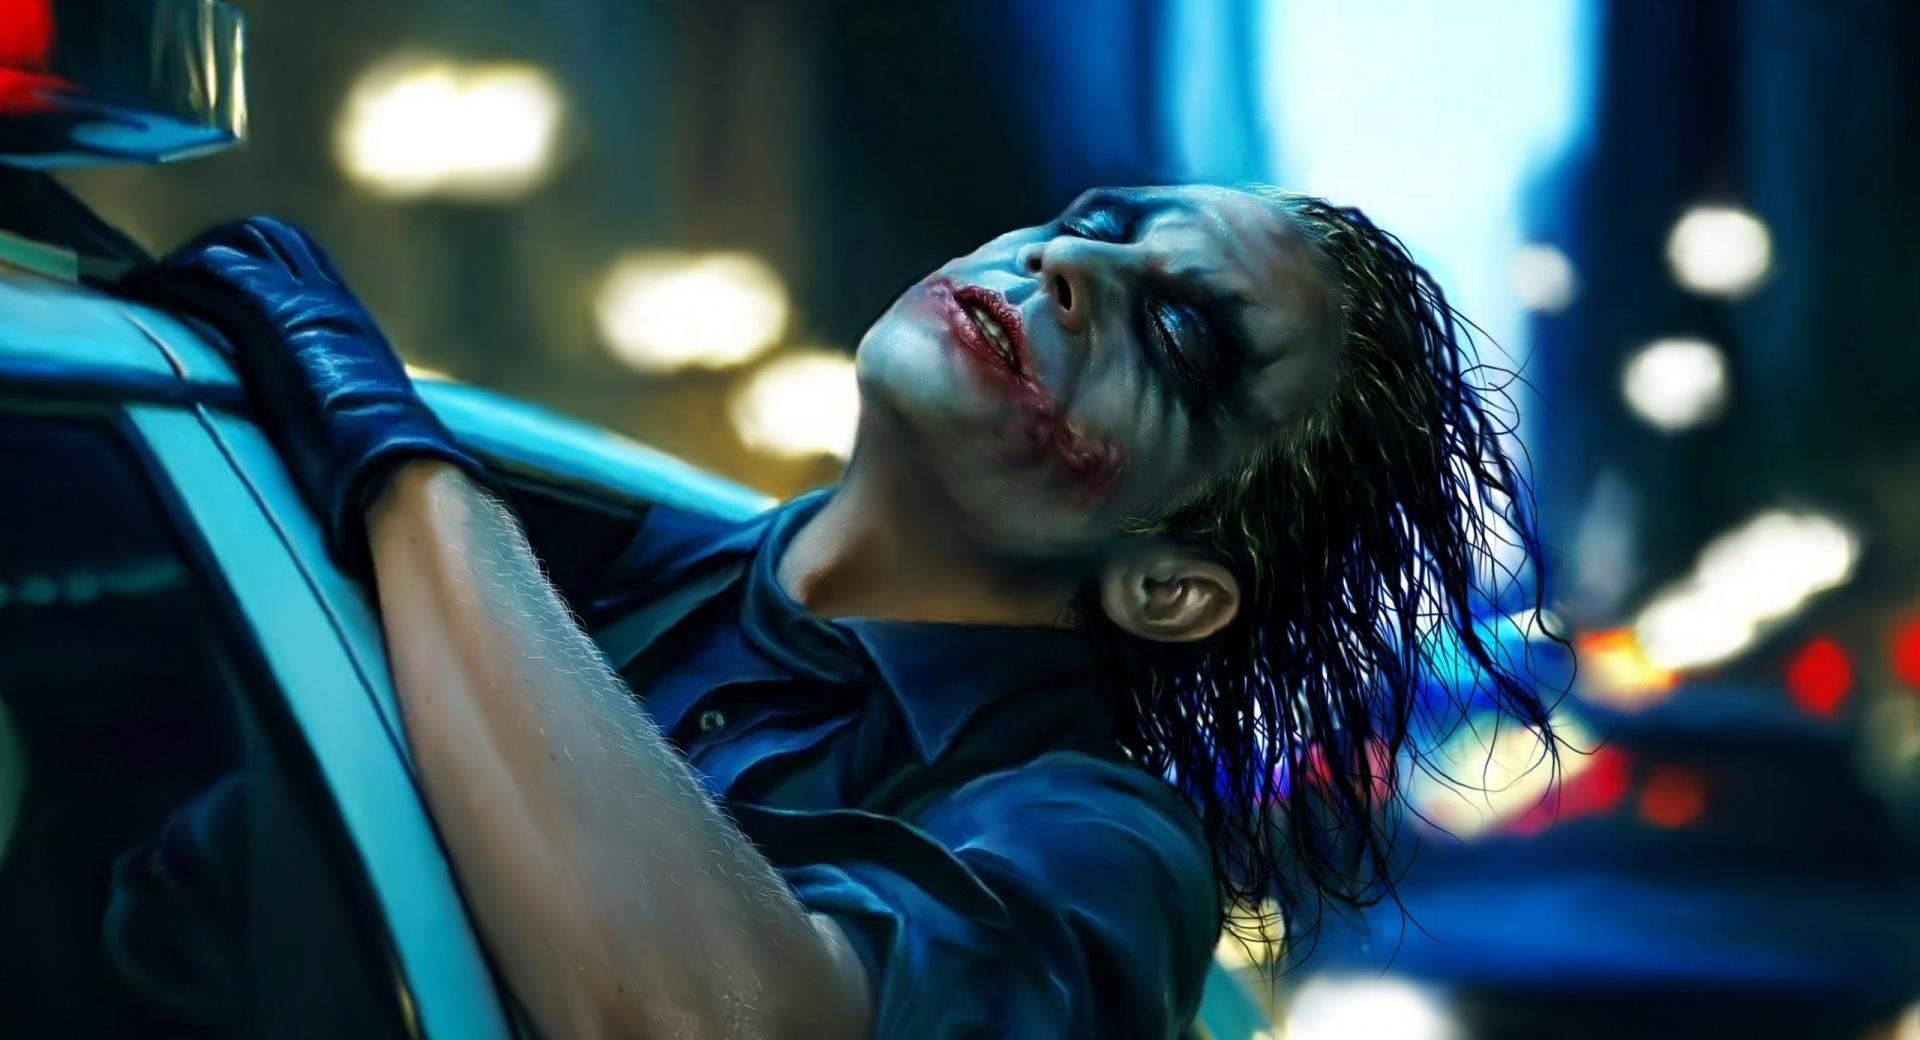 The Joker Painting Wallpaper HD Download